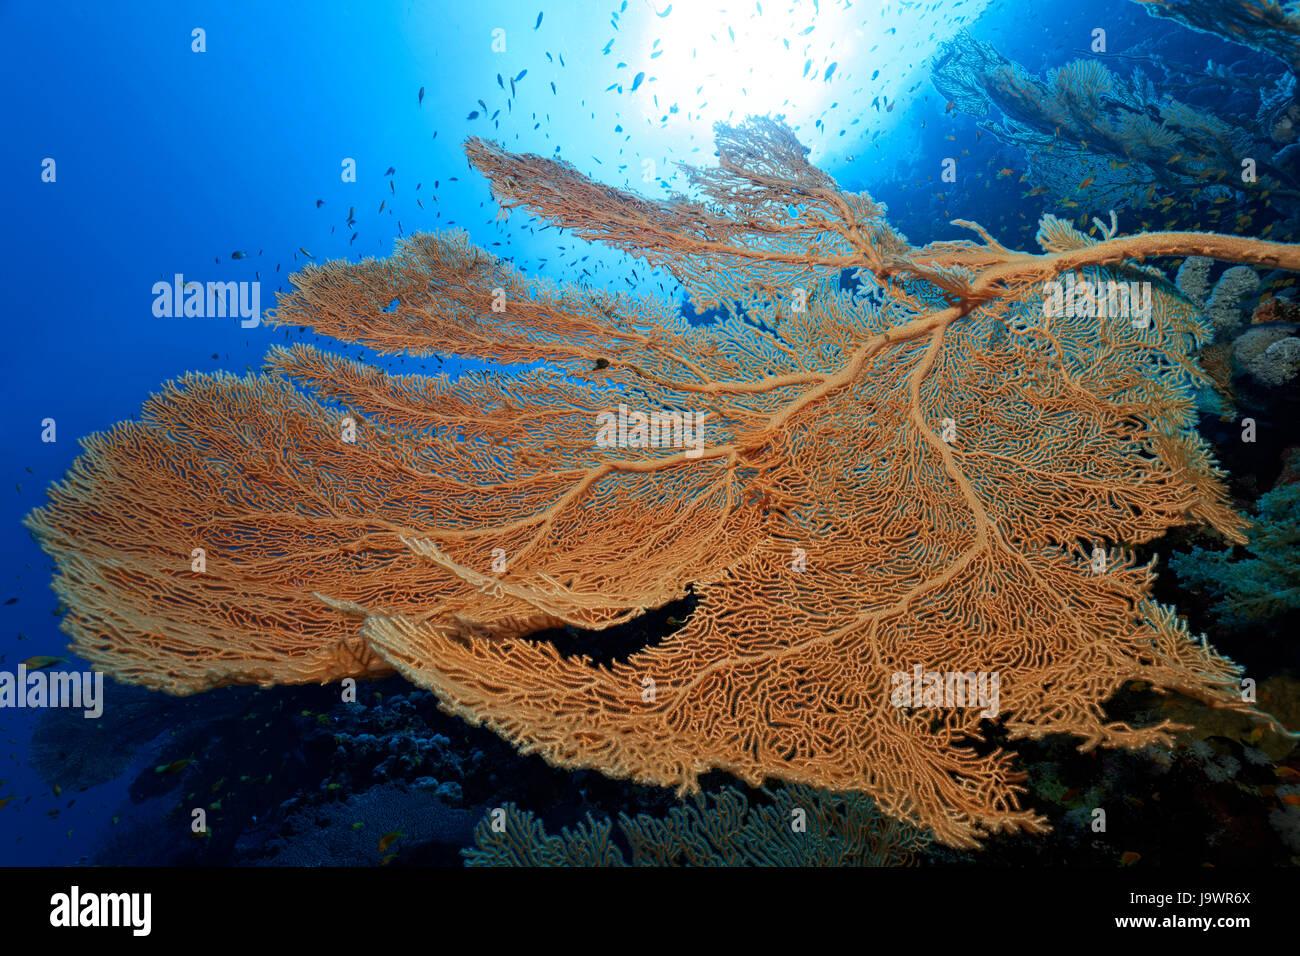 Giant sea fan (Annella mollis) backlit, sun, Red Sea, Egypt - Stock Image